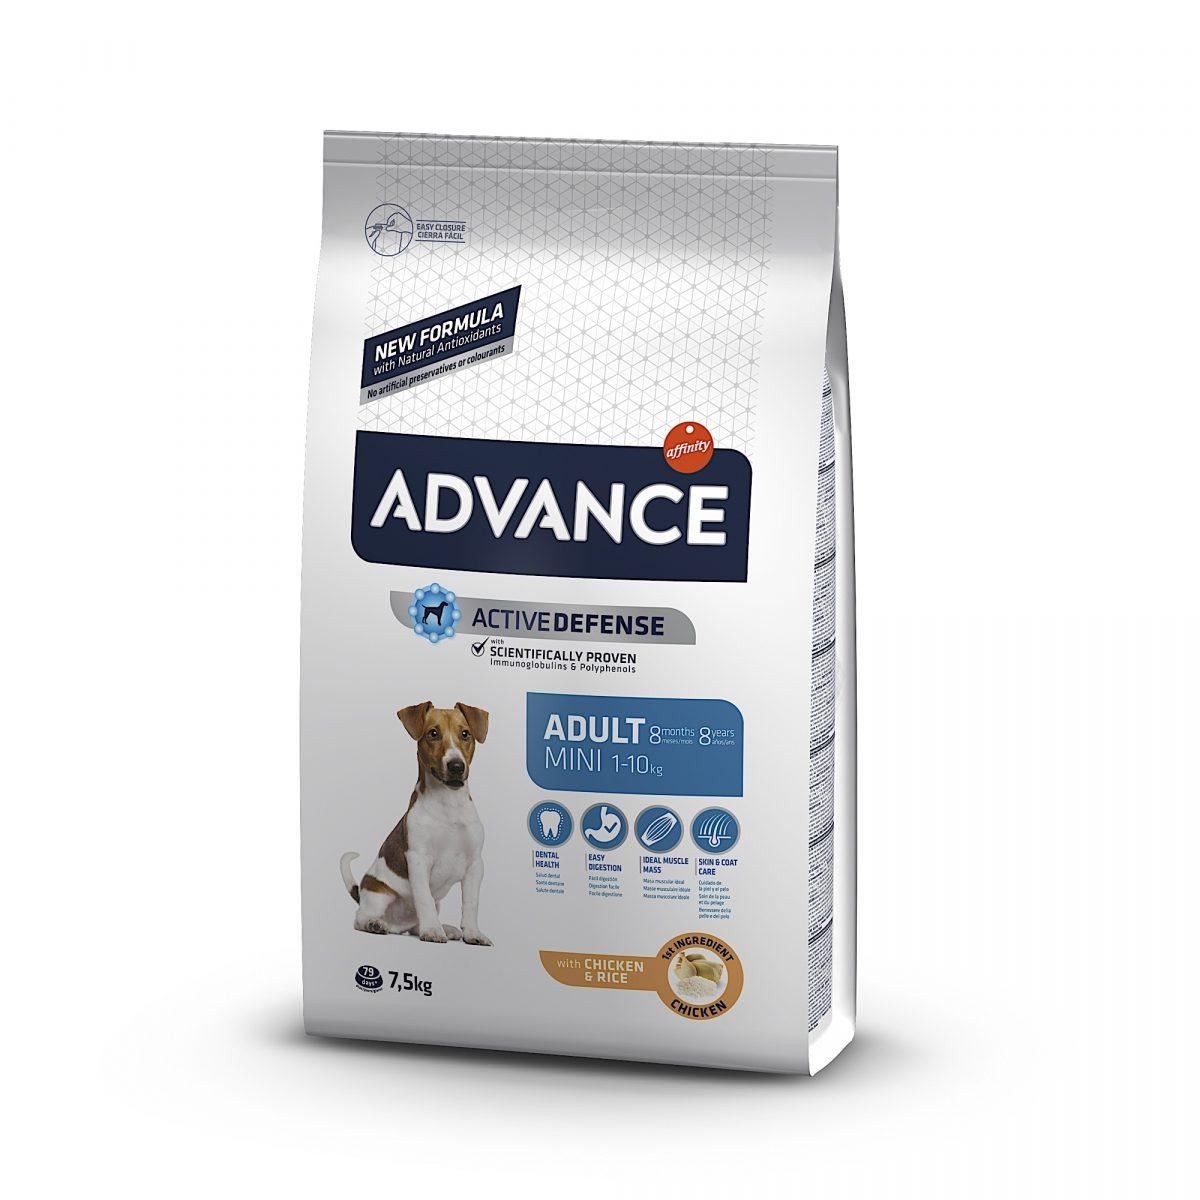 Advance Mini Adult Chicken & Rice 7.5kg